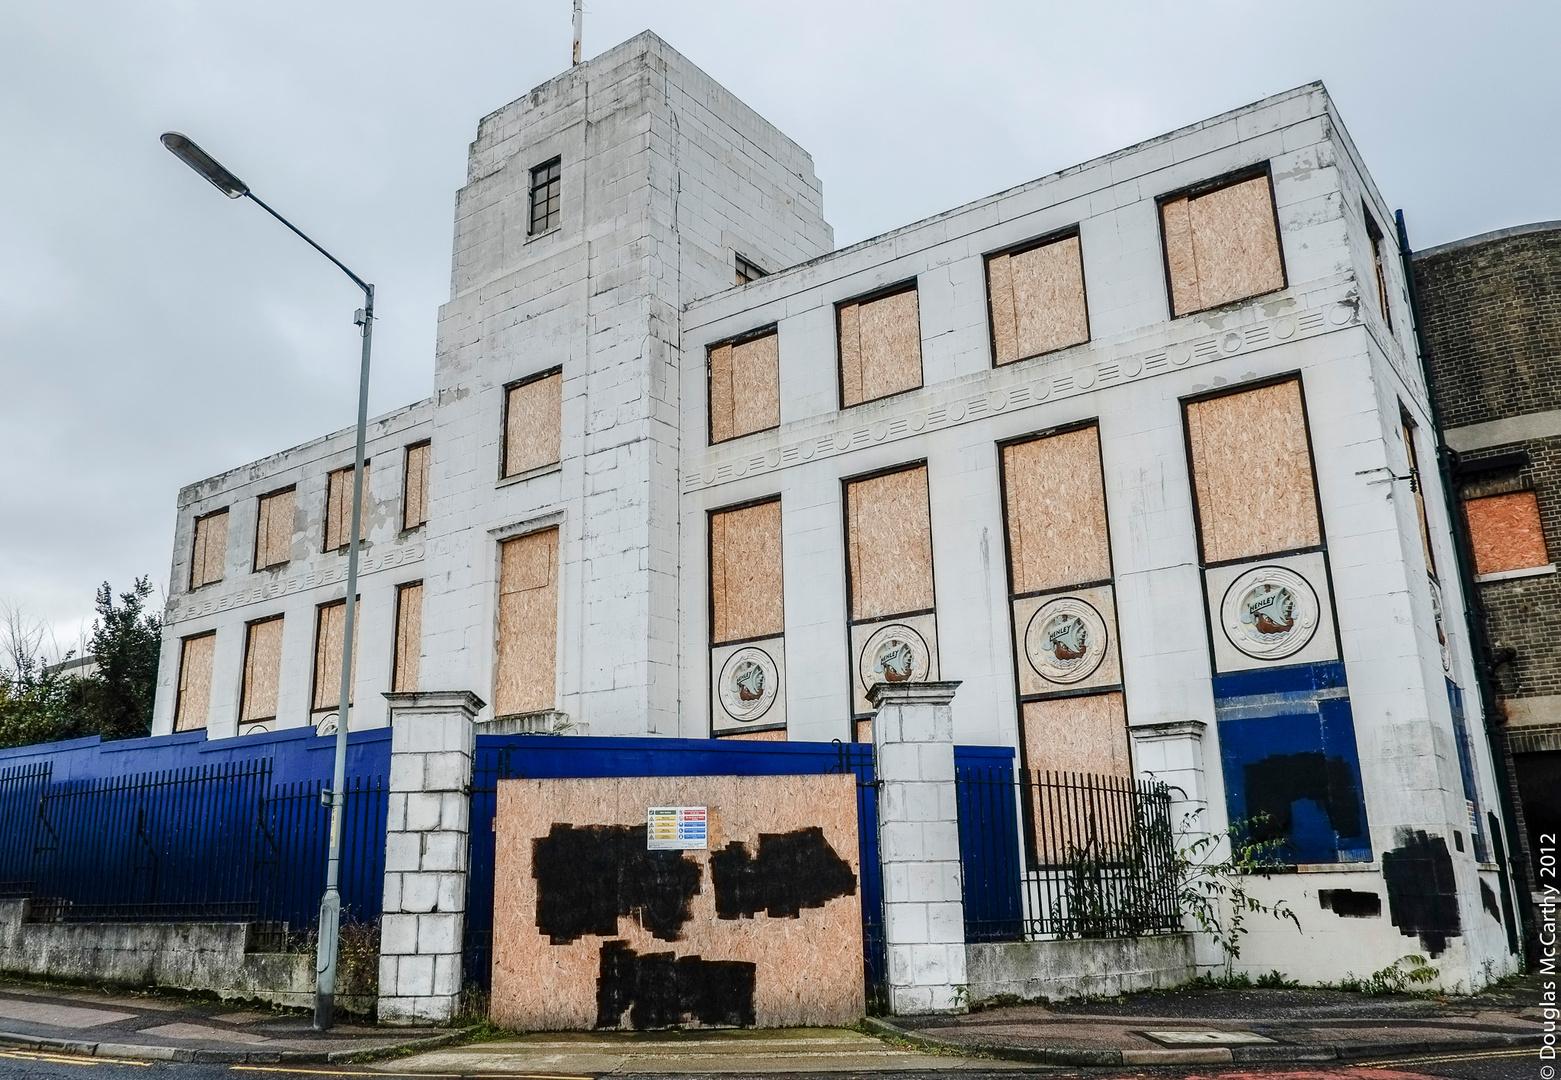 WT Henley Telegraph Works, Gravesend